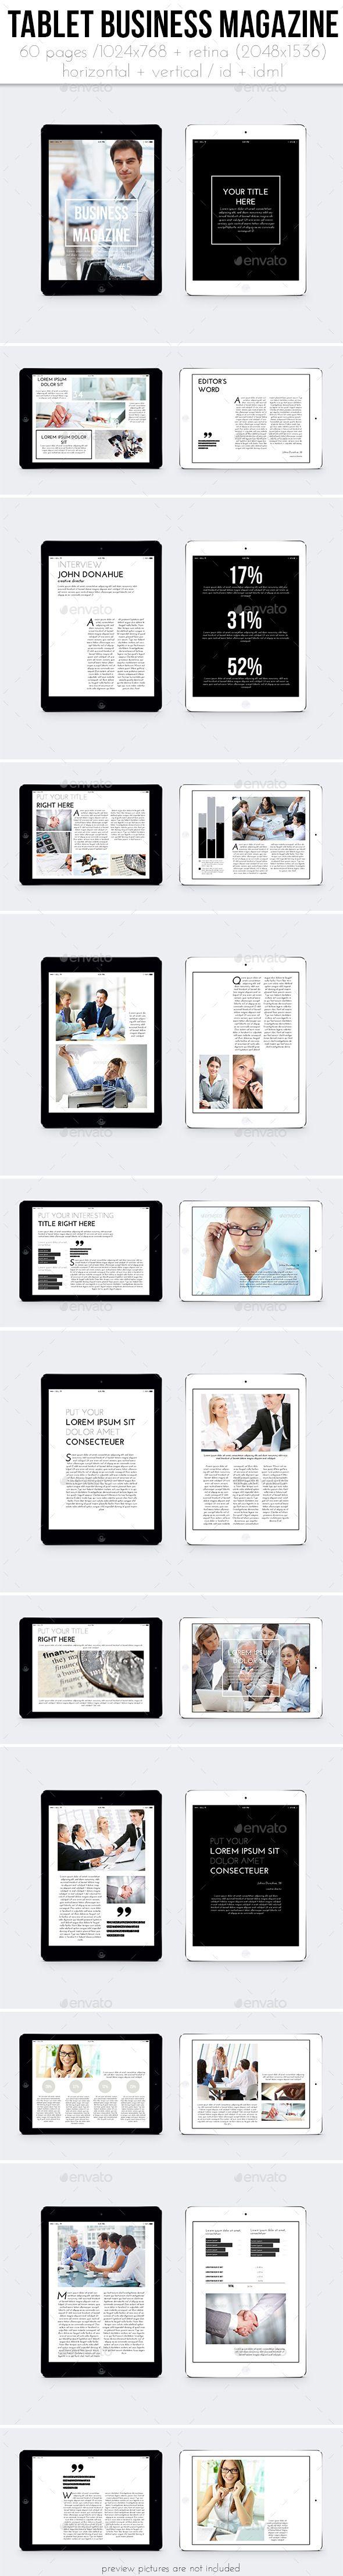 iPad &Tablet Business Magazine Tempalte #design Download: http://graphicriver.net/item/ipad-tablet-business-magazine/11774821?ref=ksioks